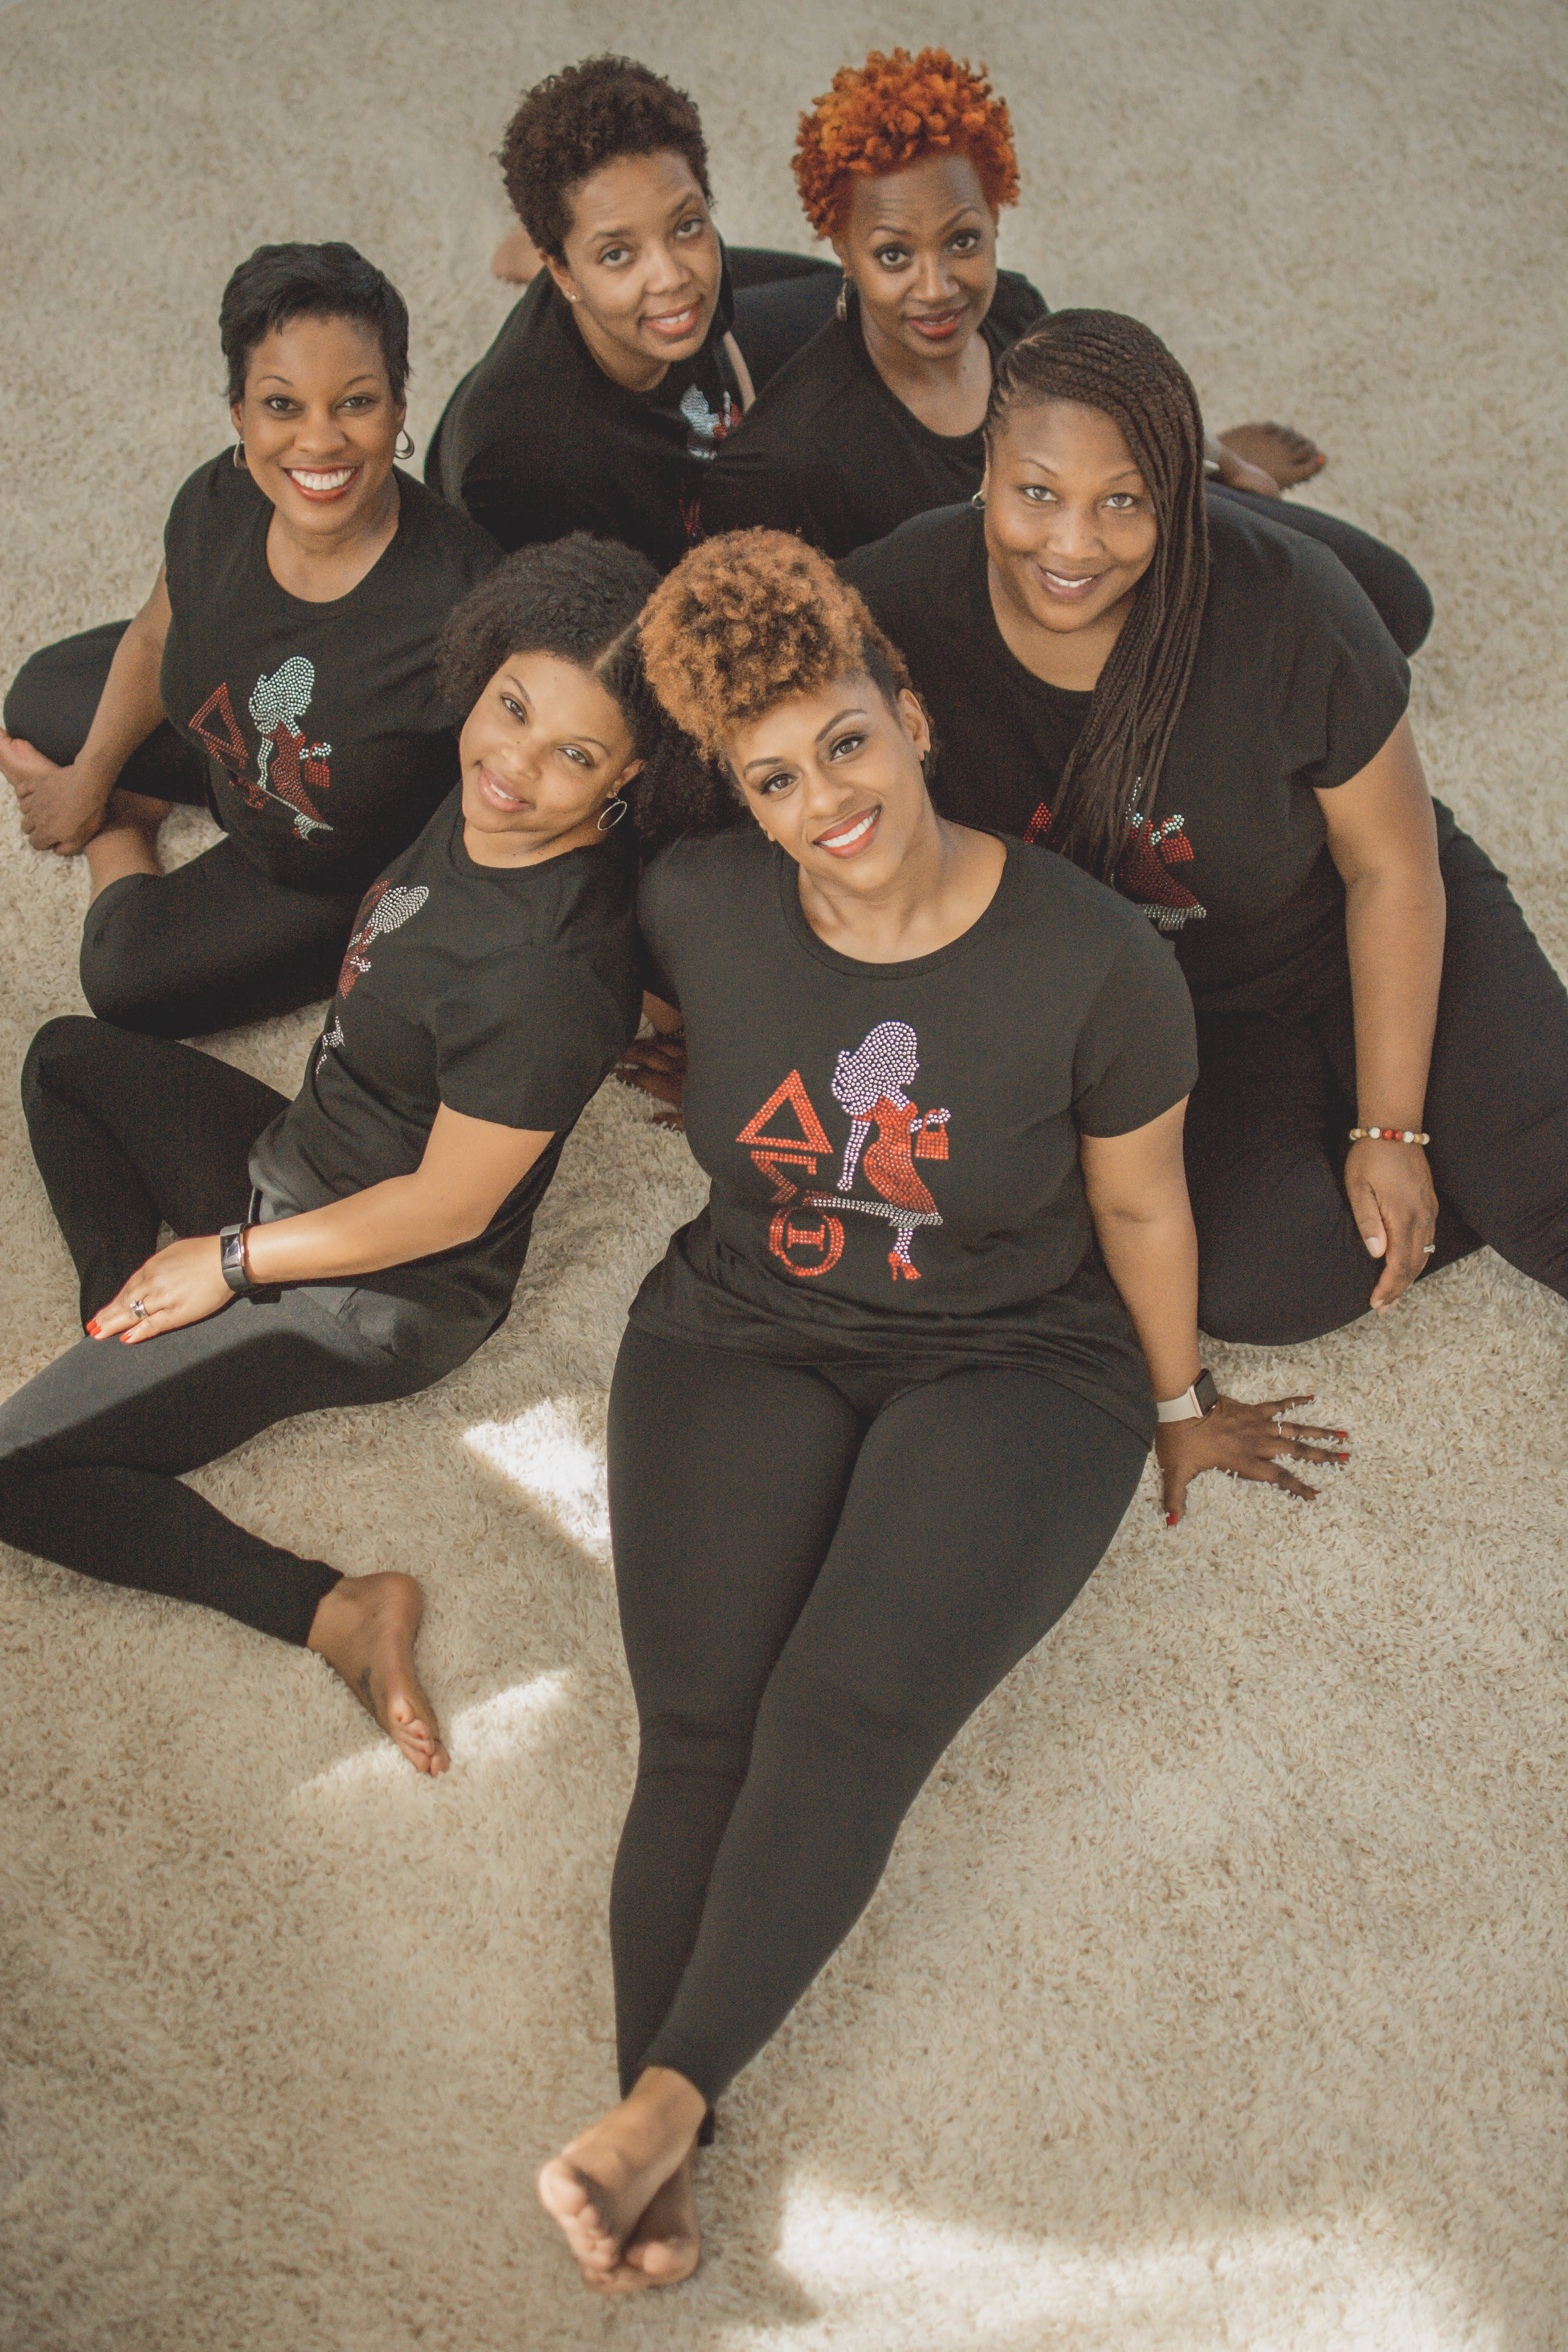 Rona Dana (center) and her line sisters, the ladies of Delta Sigma Theta Sorority, Inc.